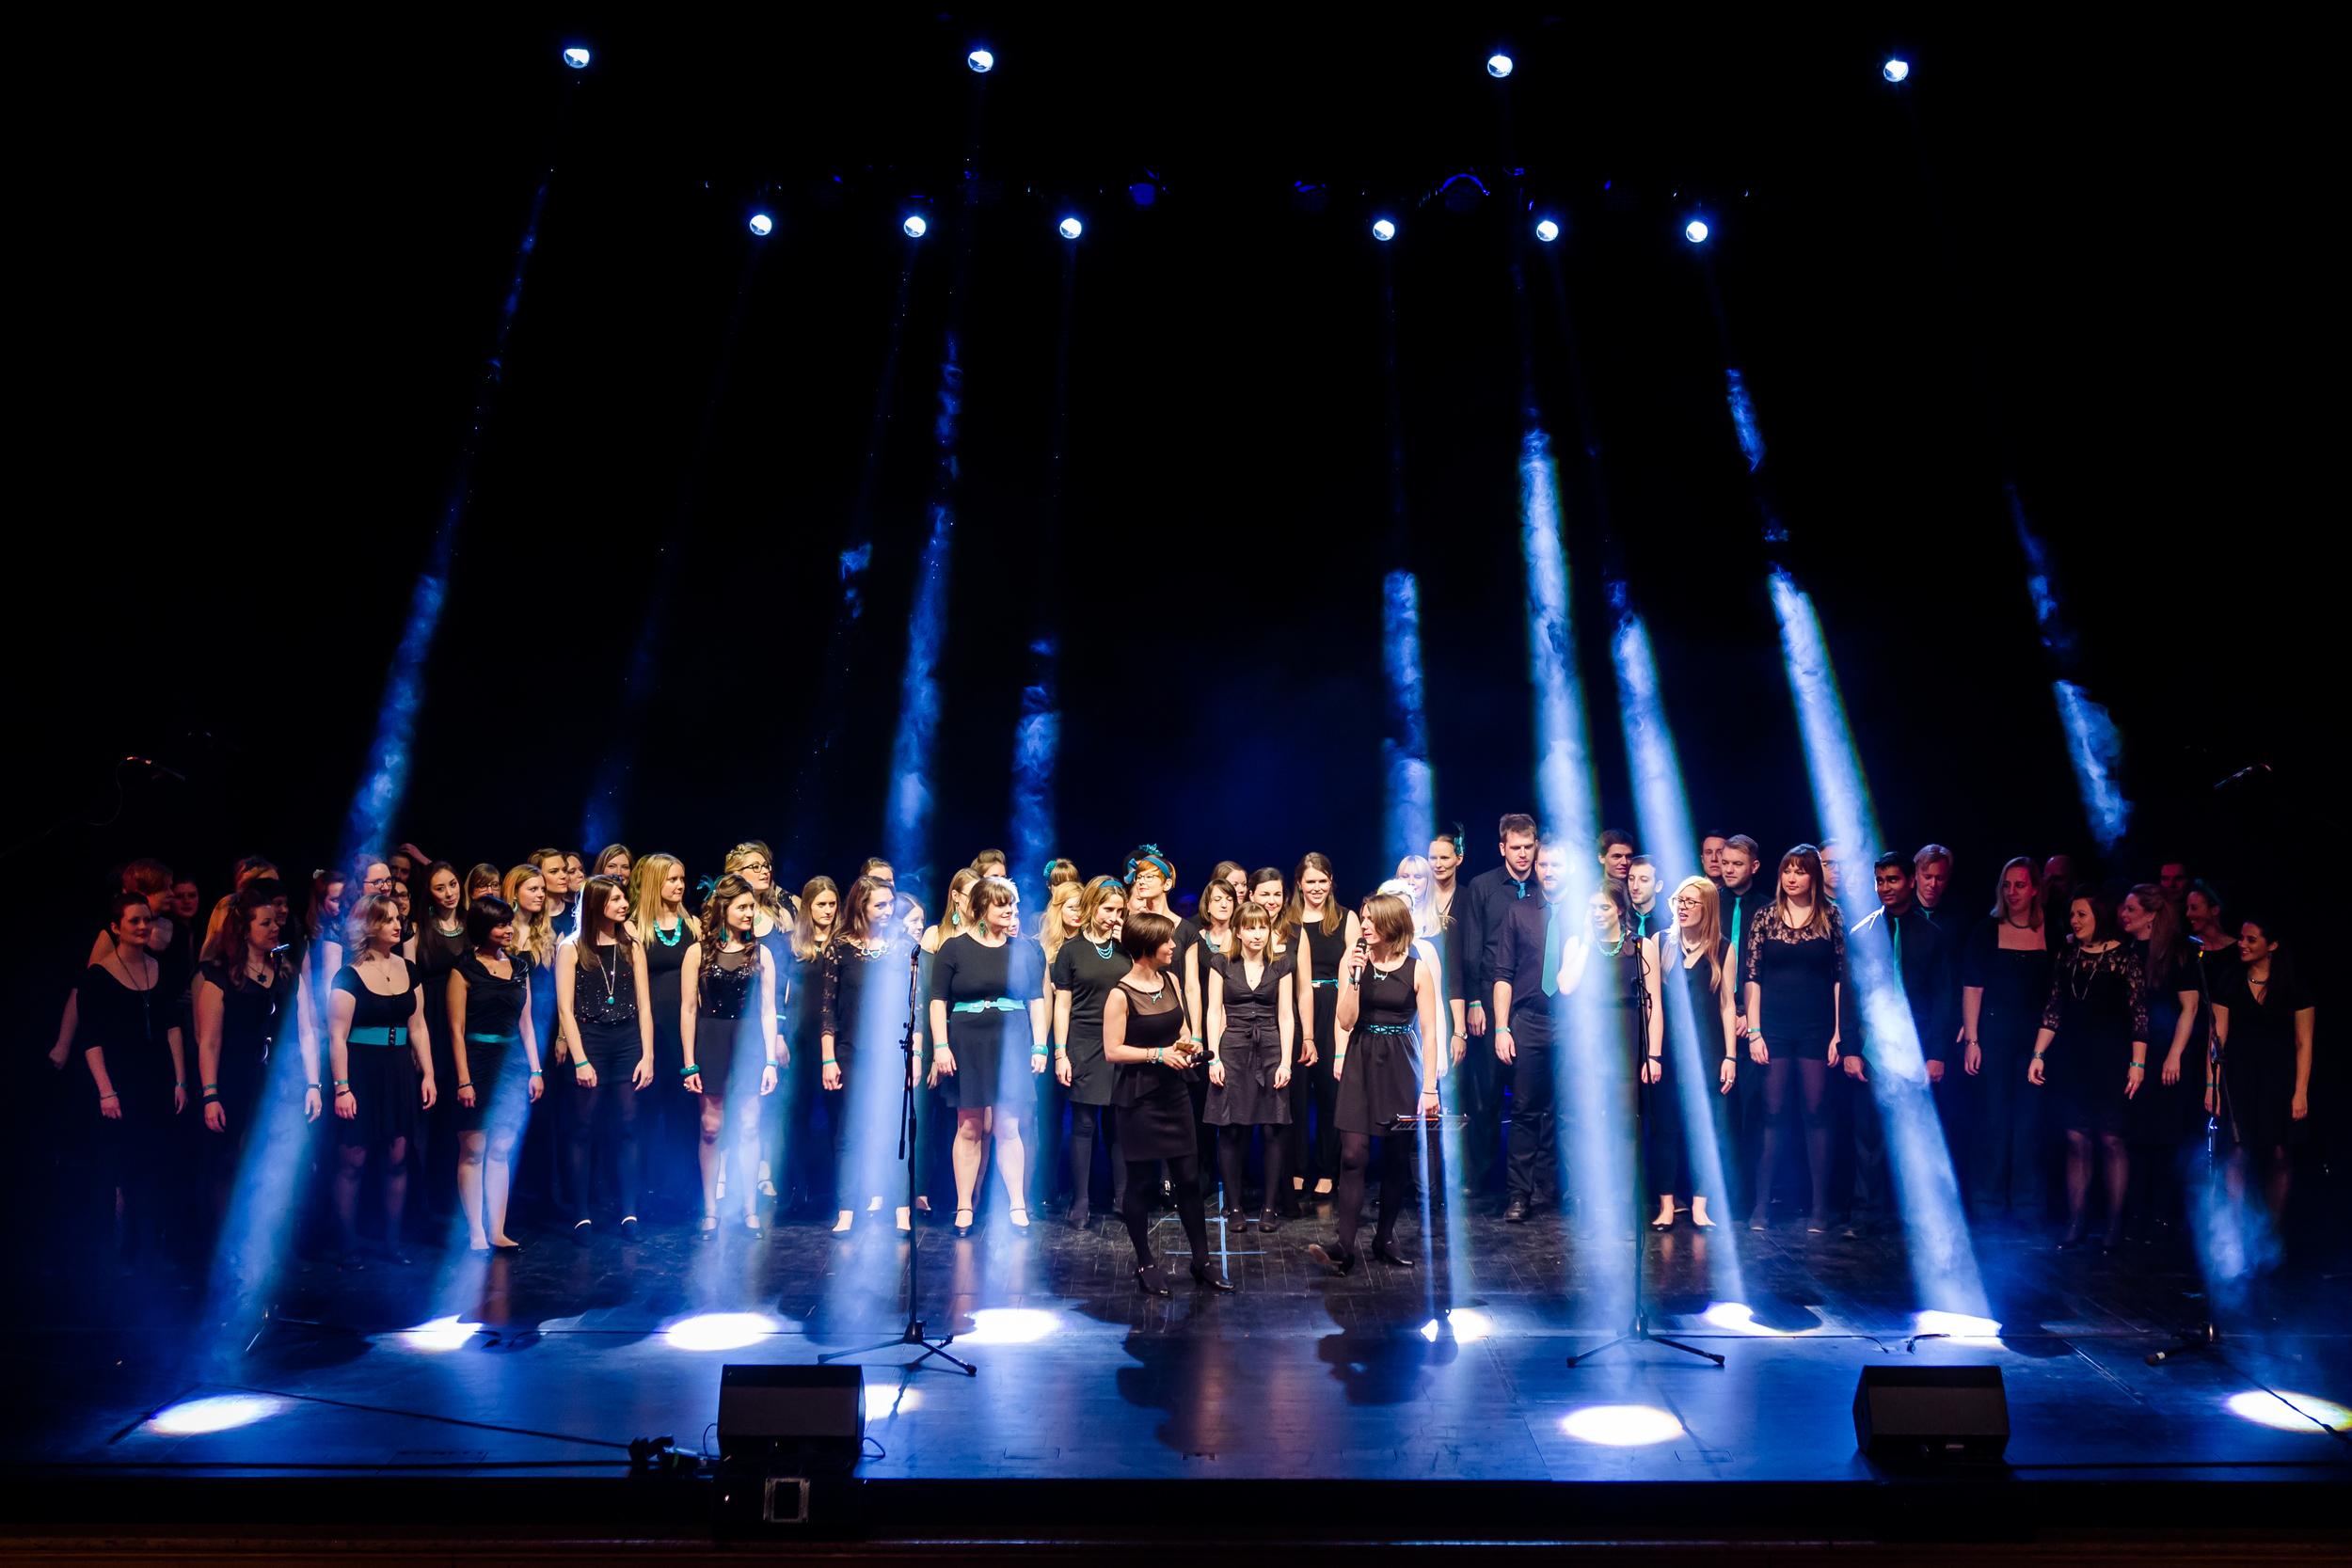 Starling Arts choir members unite onstage PHOTO © RICHARD DAVENPORT